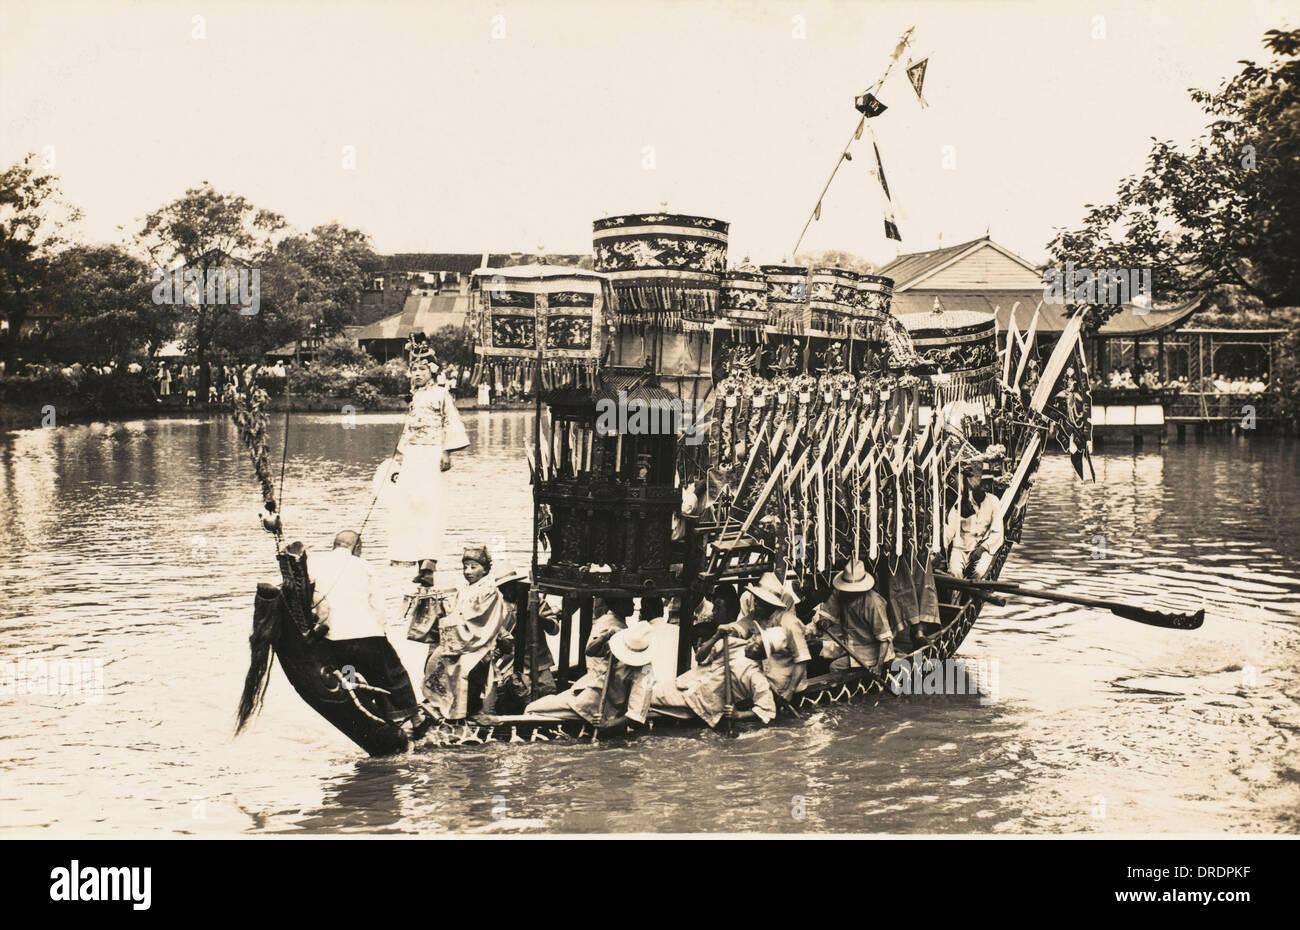 New York World Fair 1939 - Stock Image